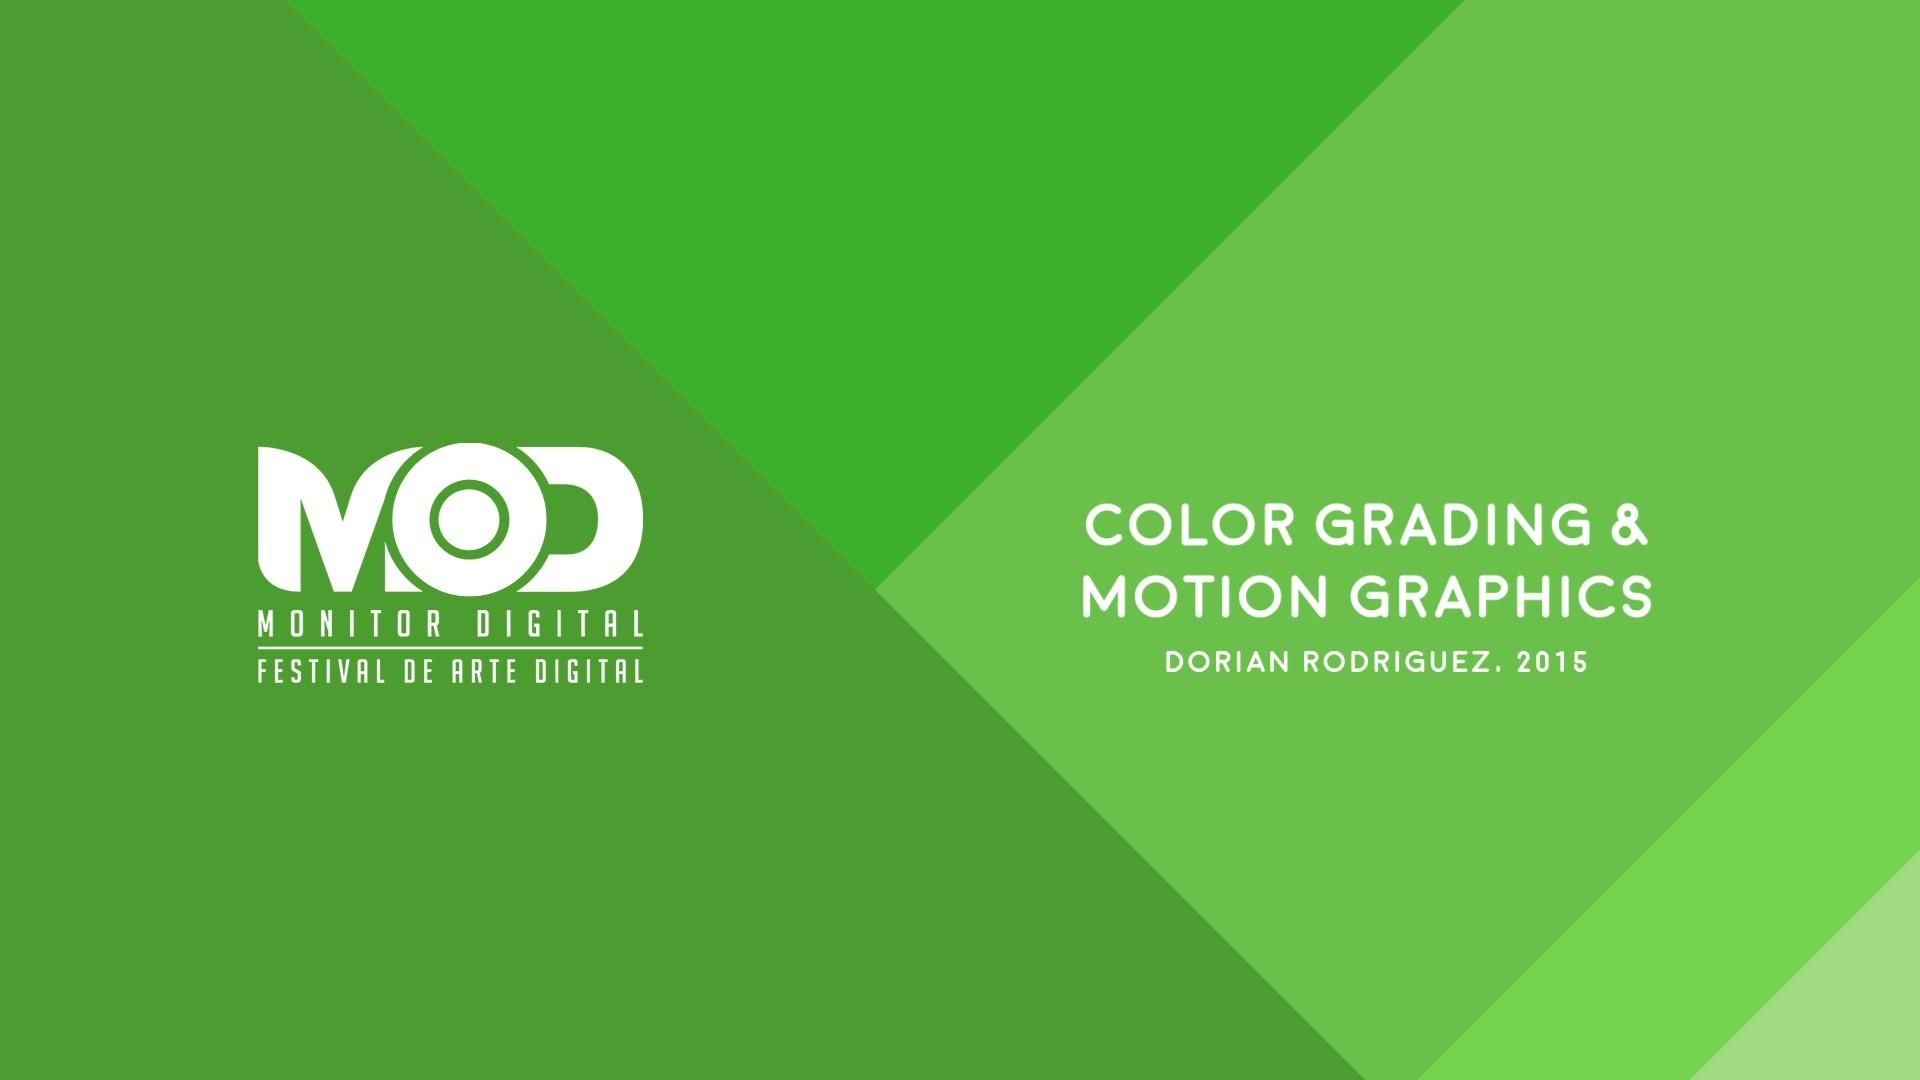 Dorian rodriguez demo reel caav mod color graddng mxf snapshot 00 03 2015 06 20 15 50 41